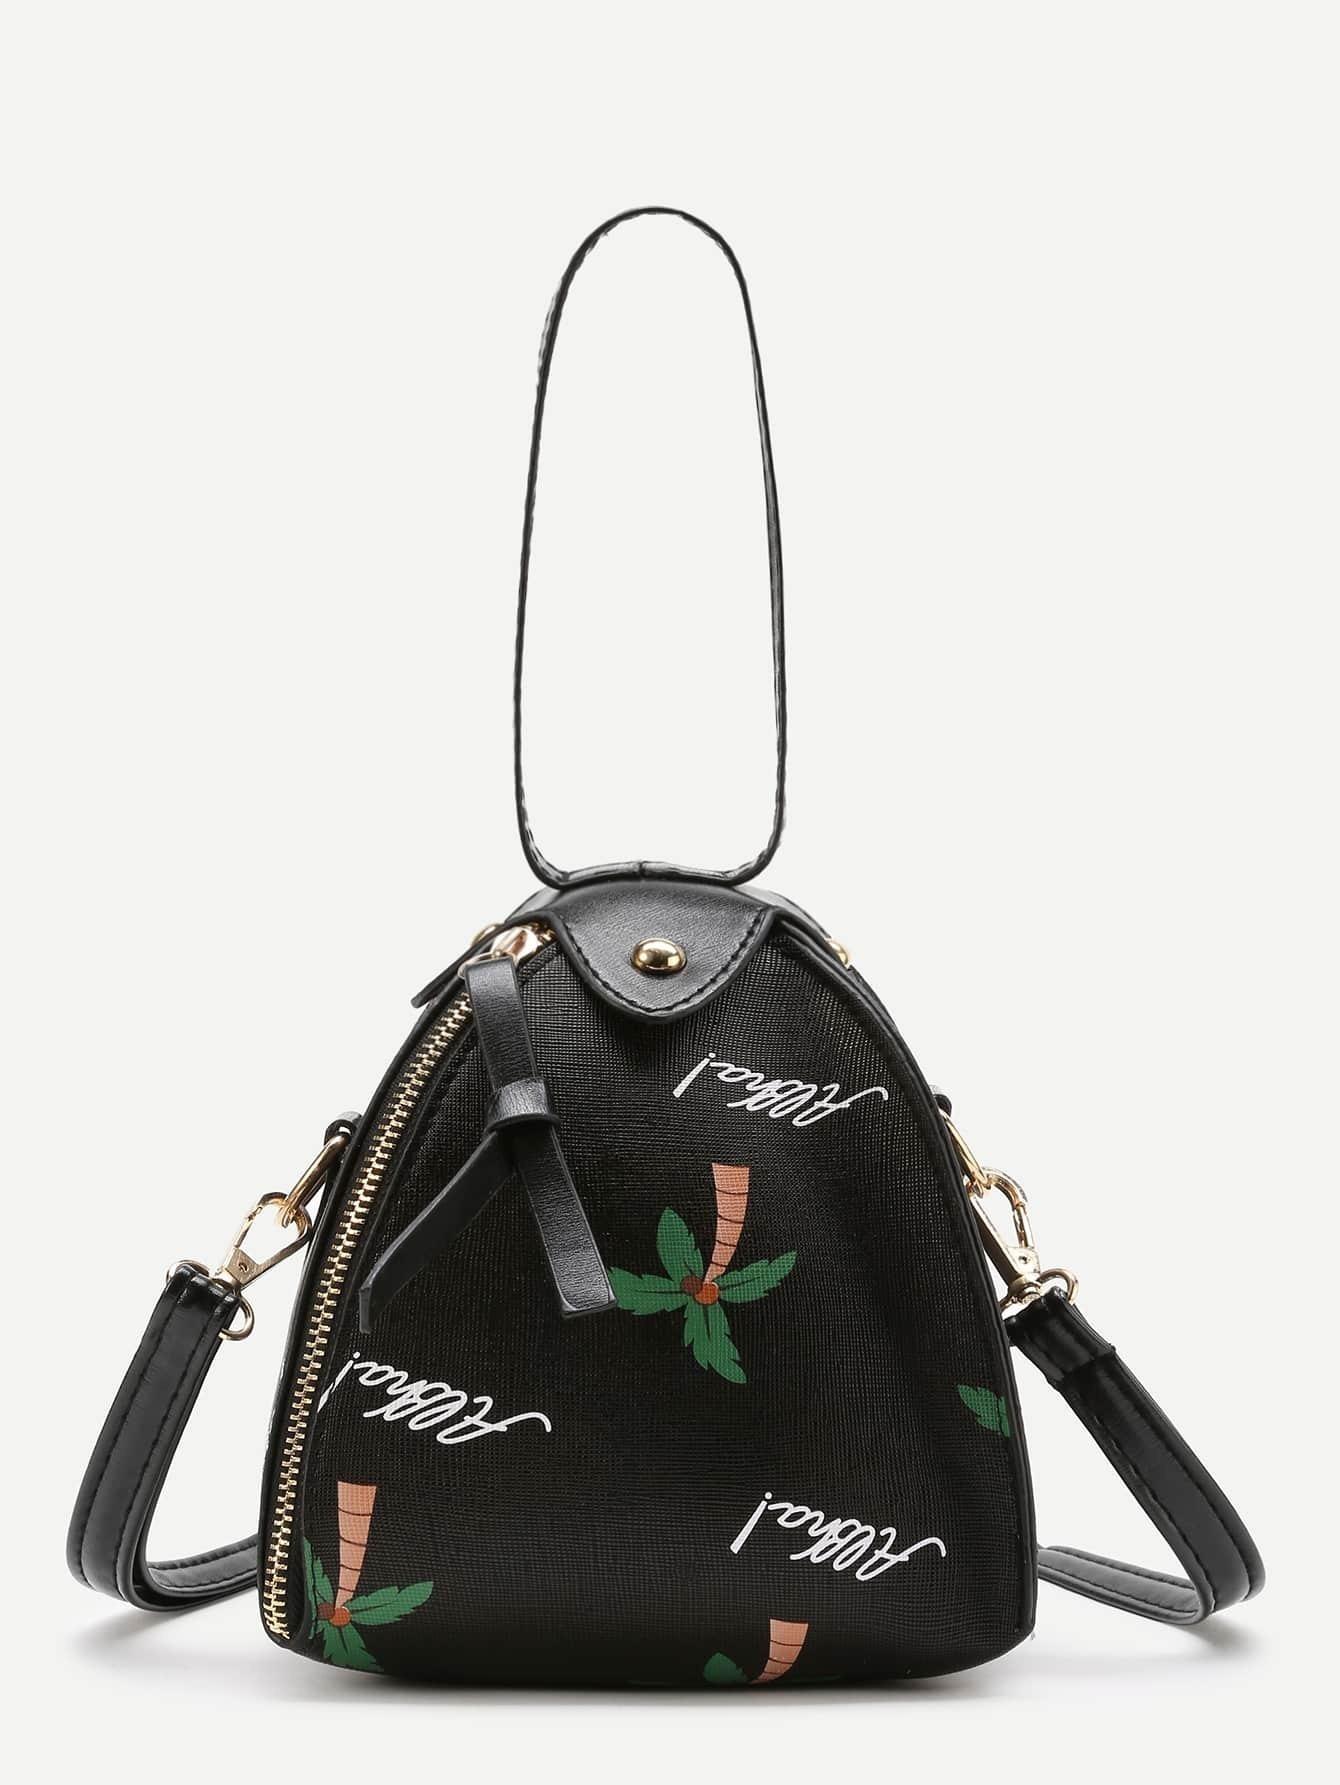 sac dos imprim palmier avec lacet convertible french romwe. Black Bedroom Furniture Sets. Home Design Ideas